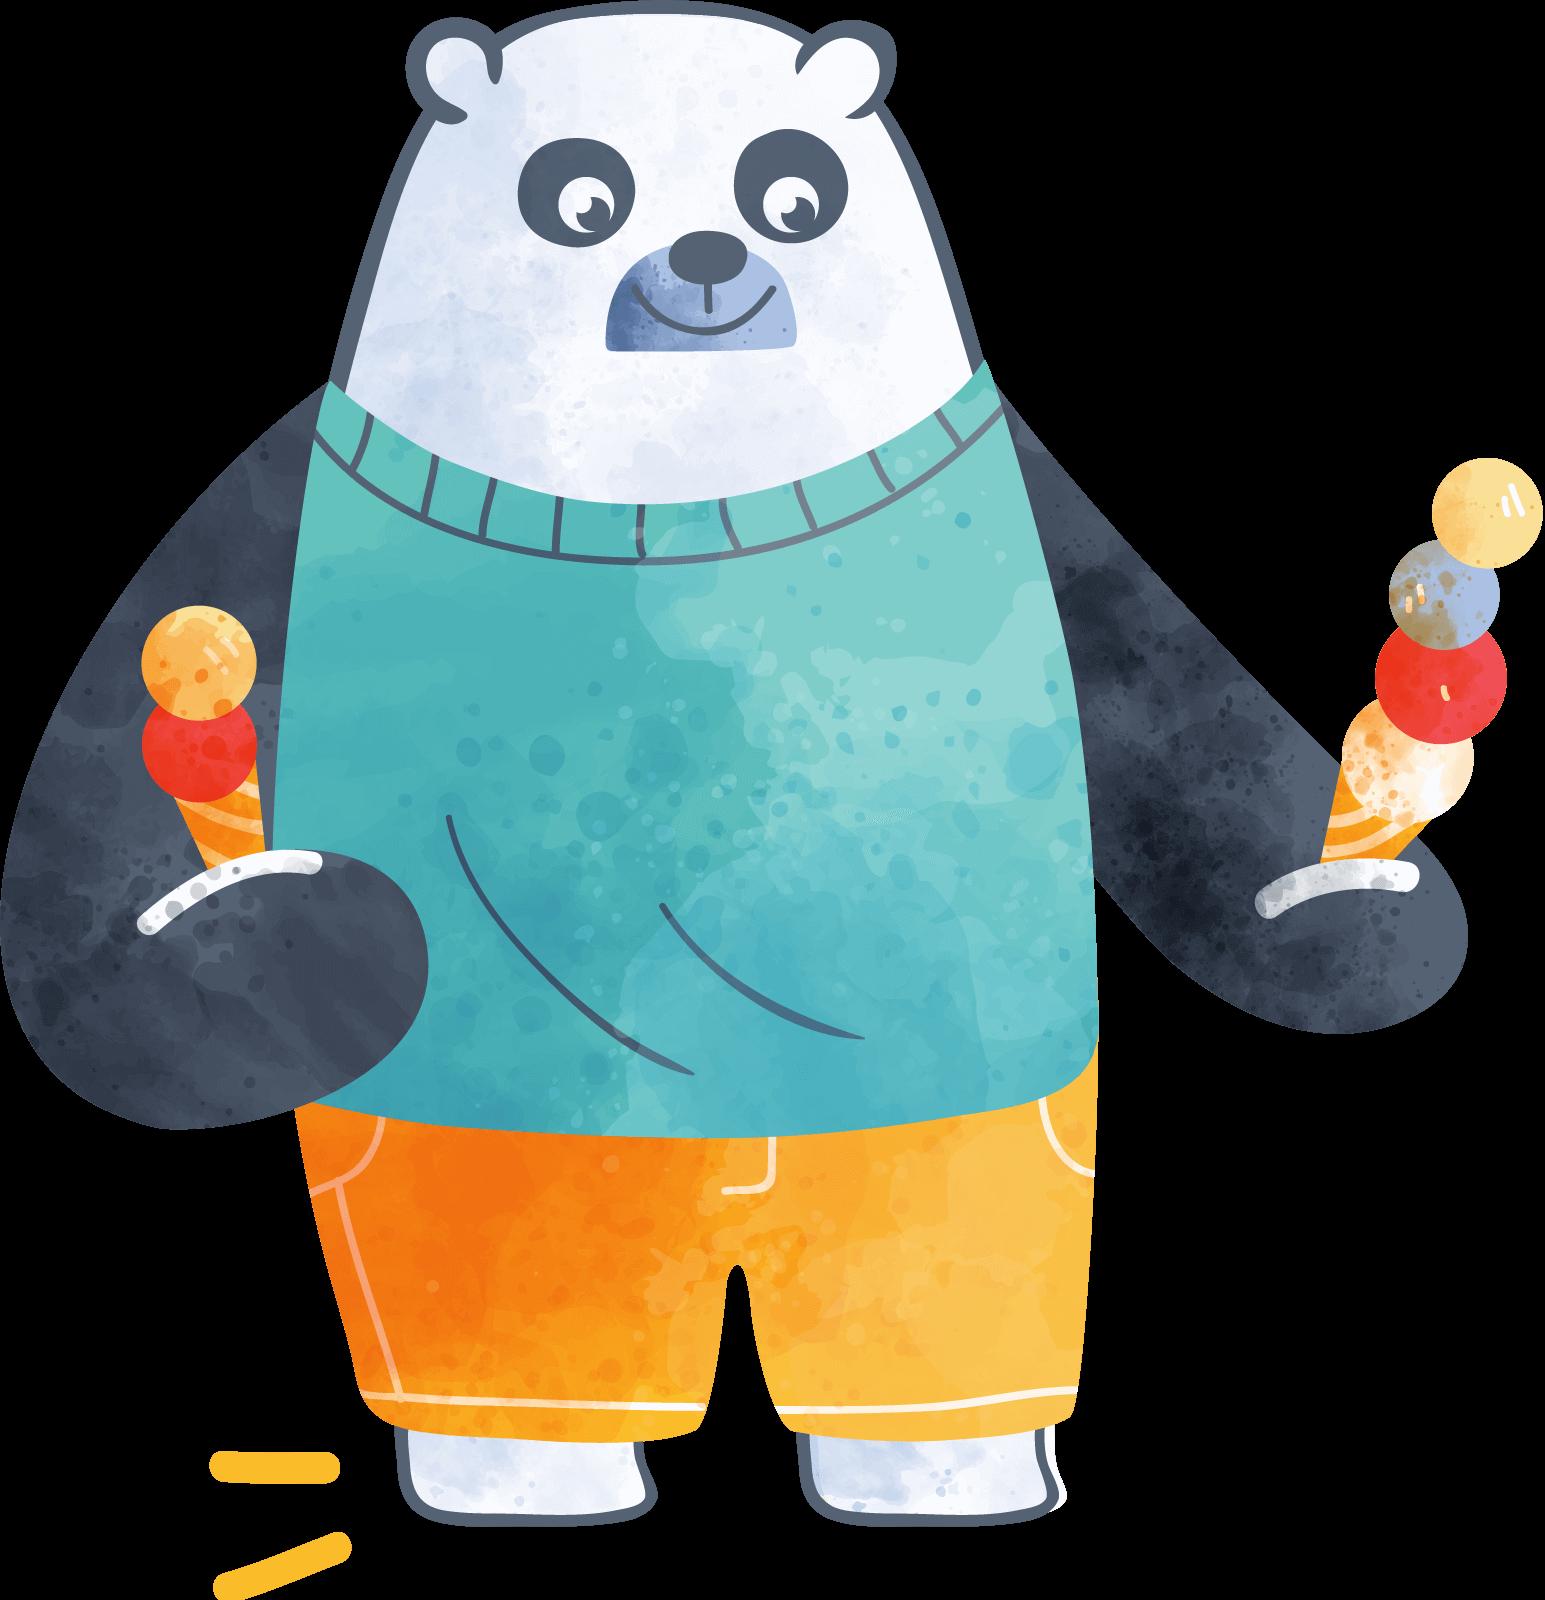 A panda bear holding ice cream cones in each hand